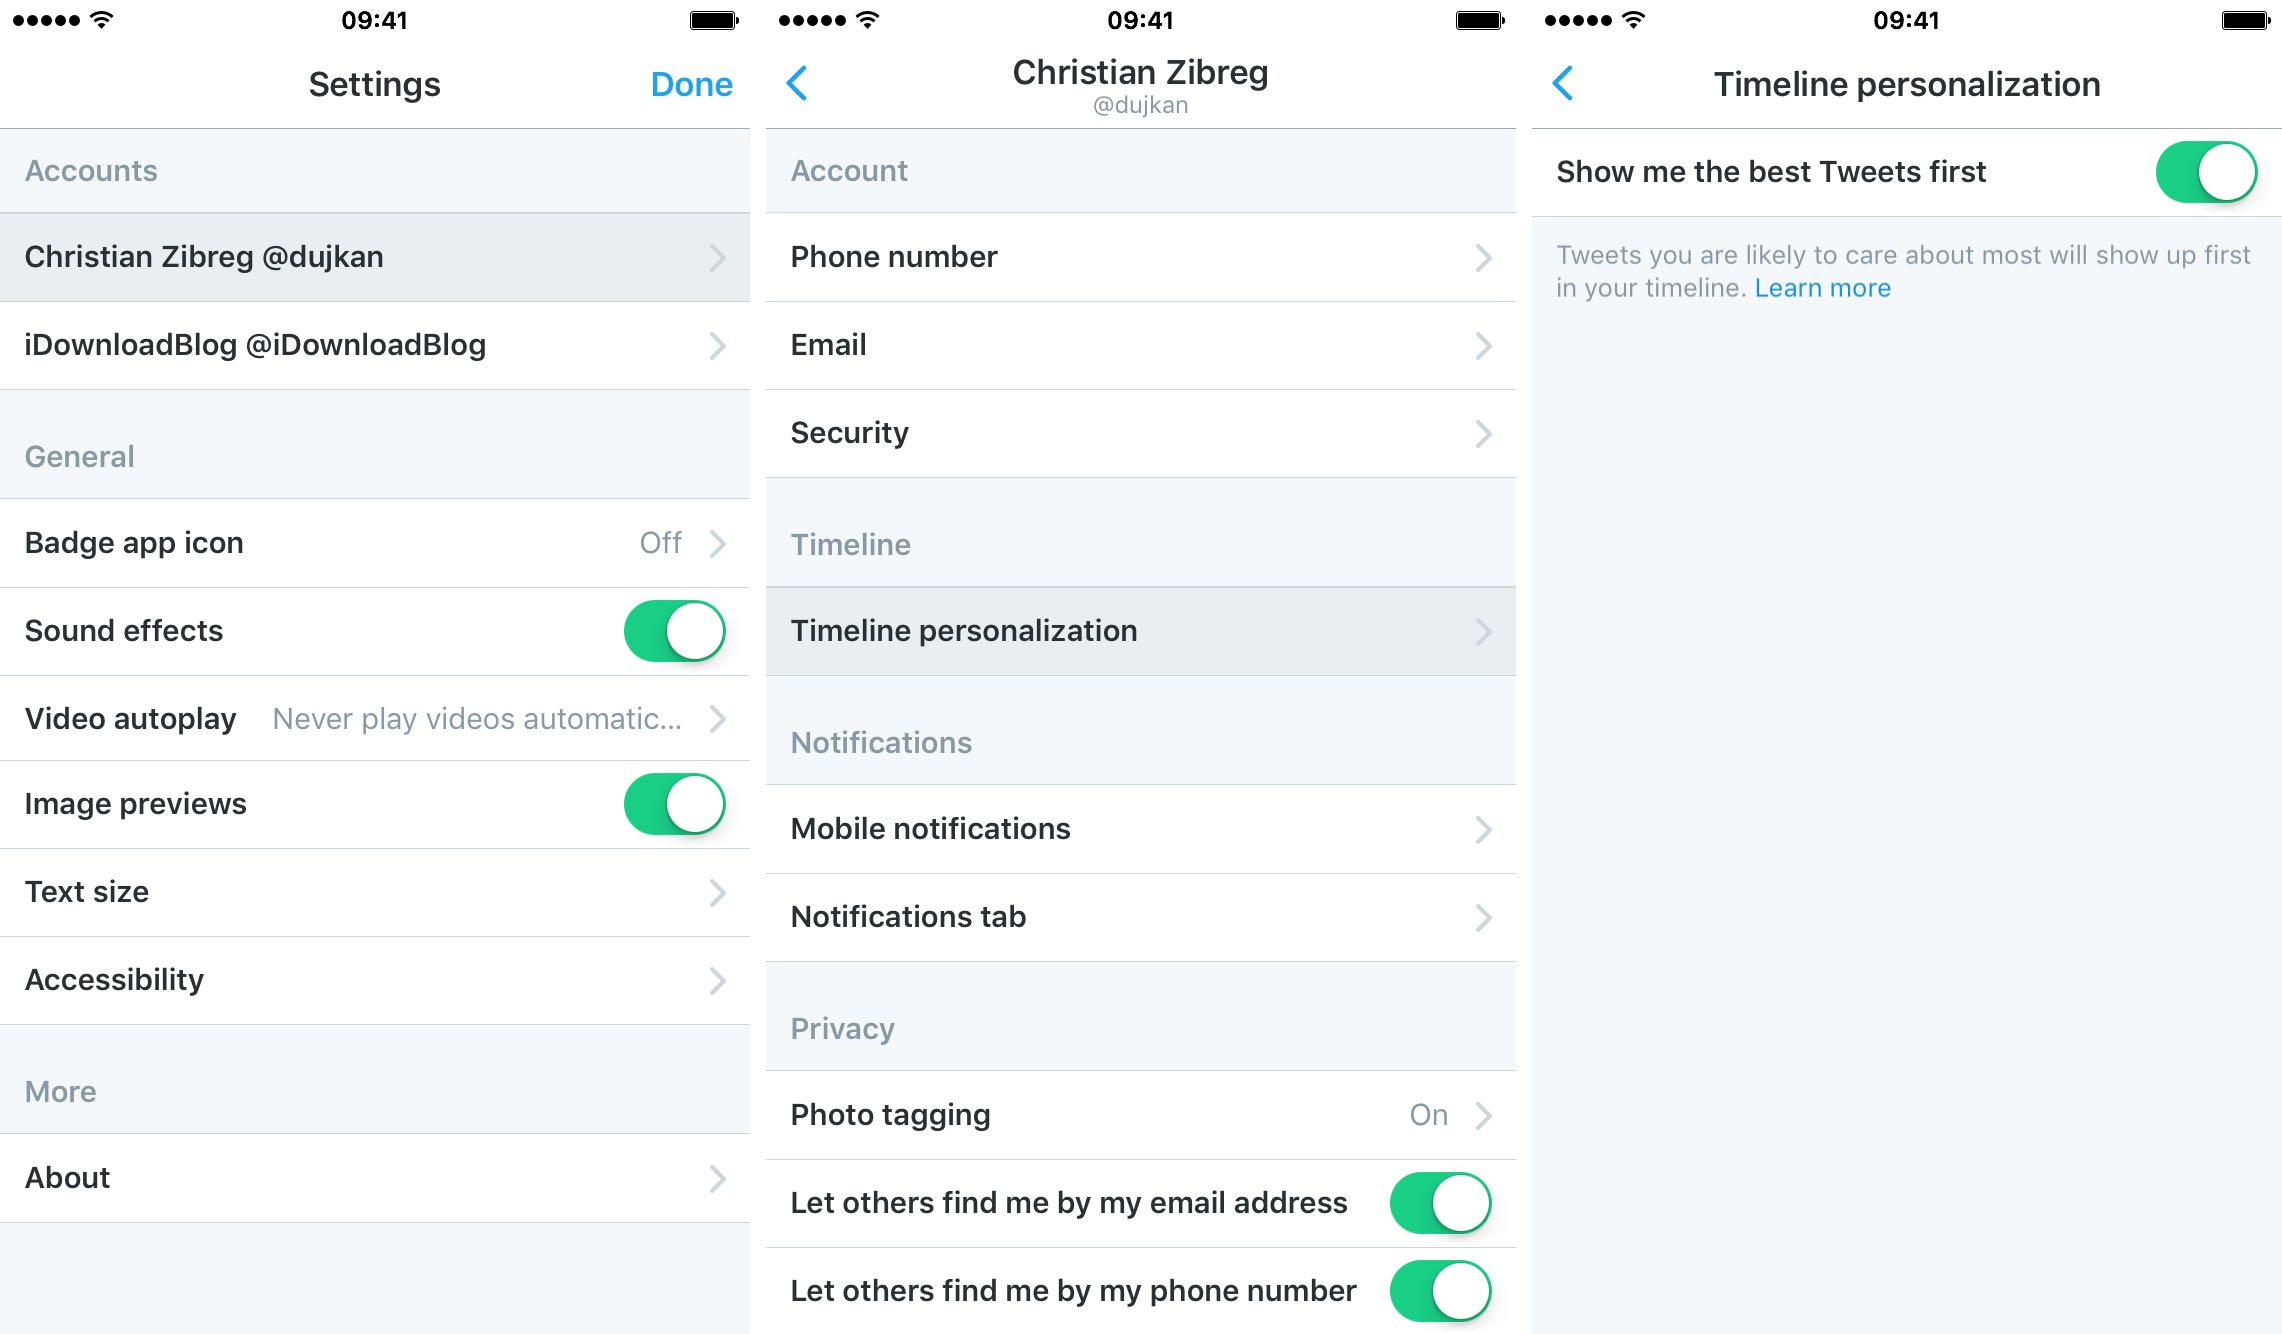 Twitter timeline personalization